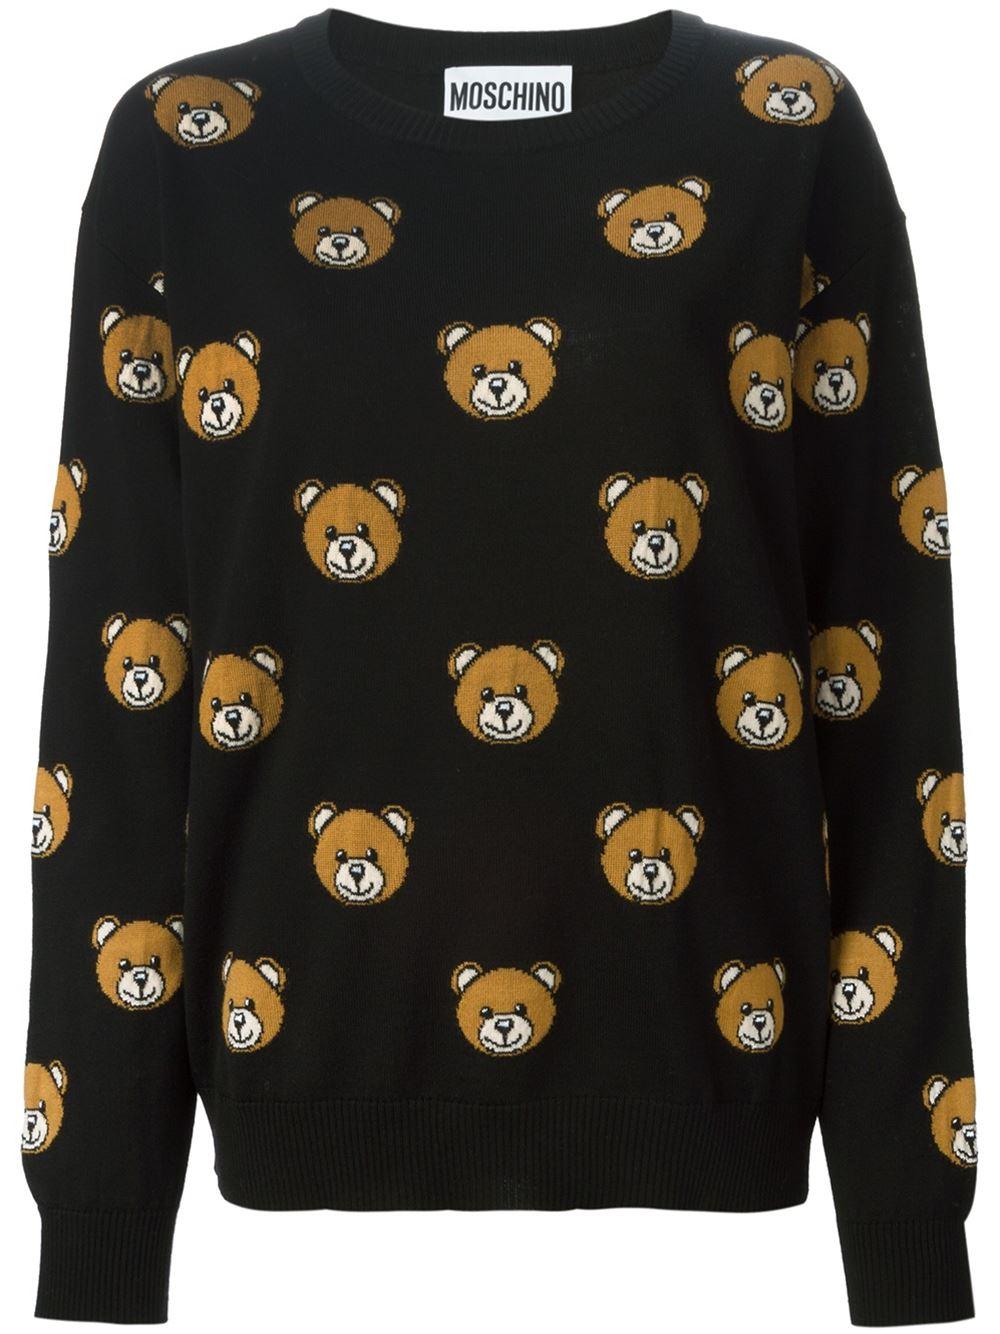 5475af1a2f8 Moschino Intarsia Teddy Bear Sweater - Boutique Tricot - Farfetch.com